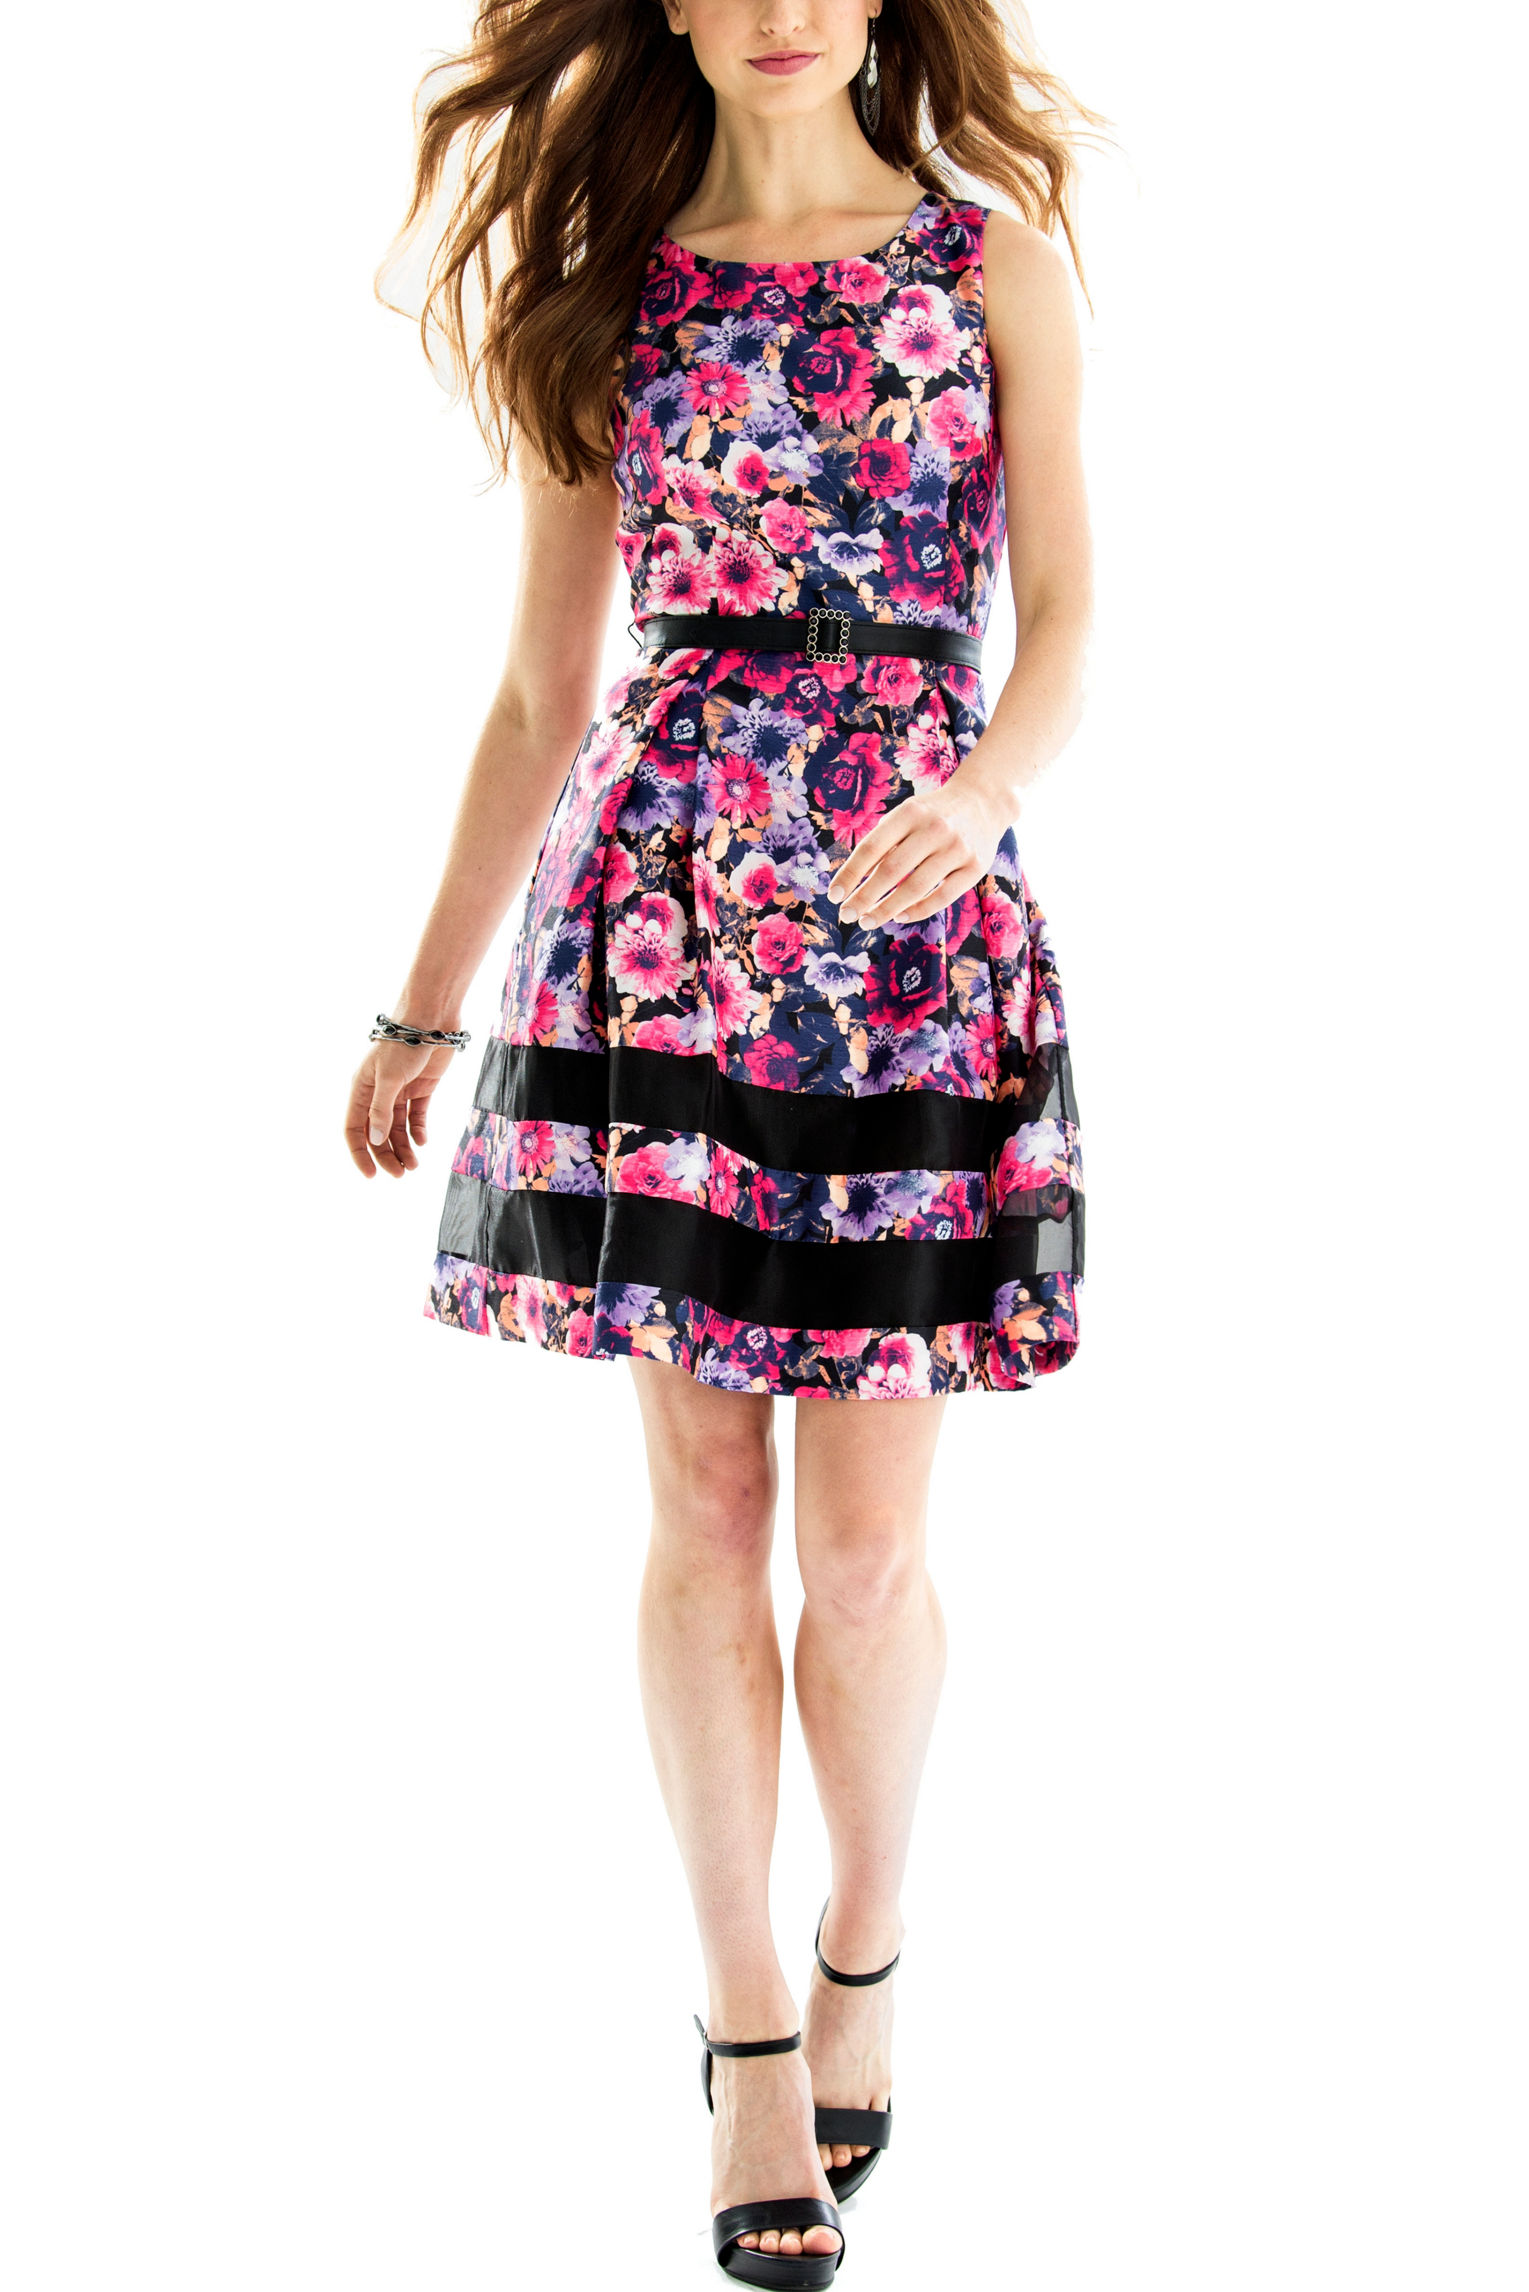 Chetta B Pink Multi Everyday & Casual Shift Dresses